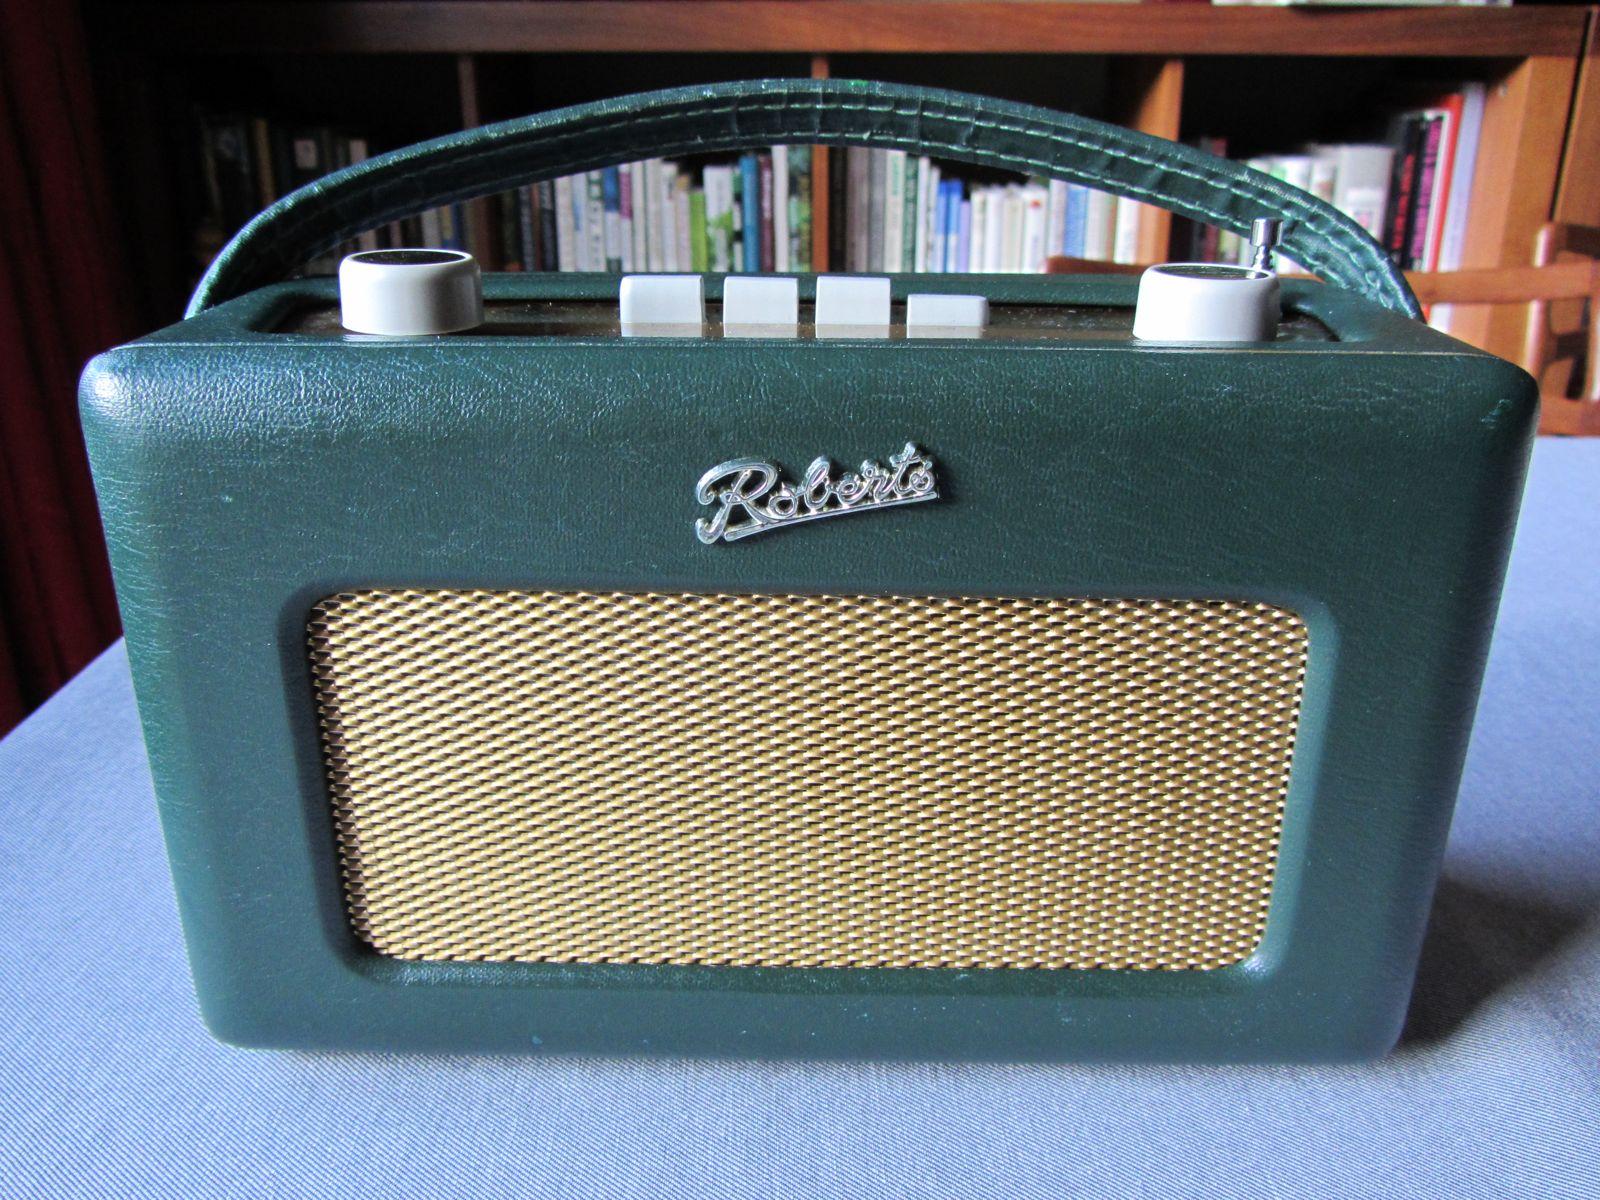 Roberts R250 / R550 - No Sound Faults - Radio Retro